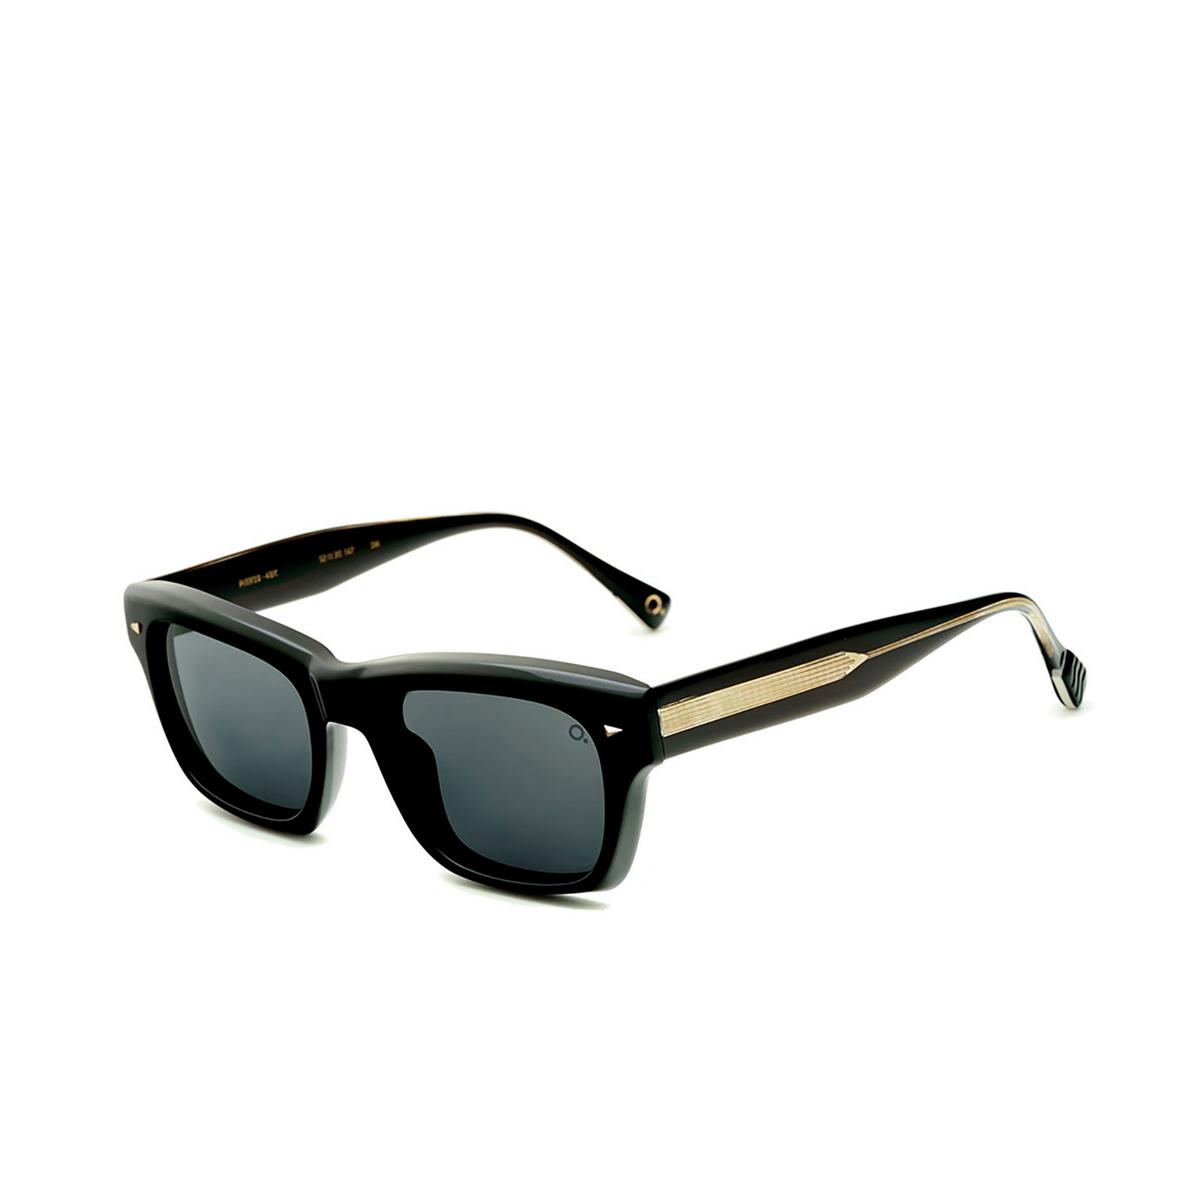 Etnia Barcelona® Square Sunglasses: PIER 59 color Bk.